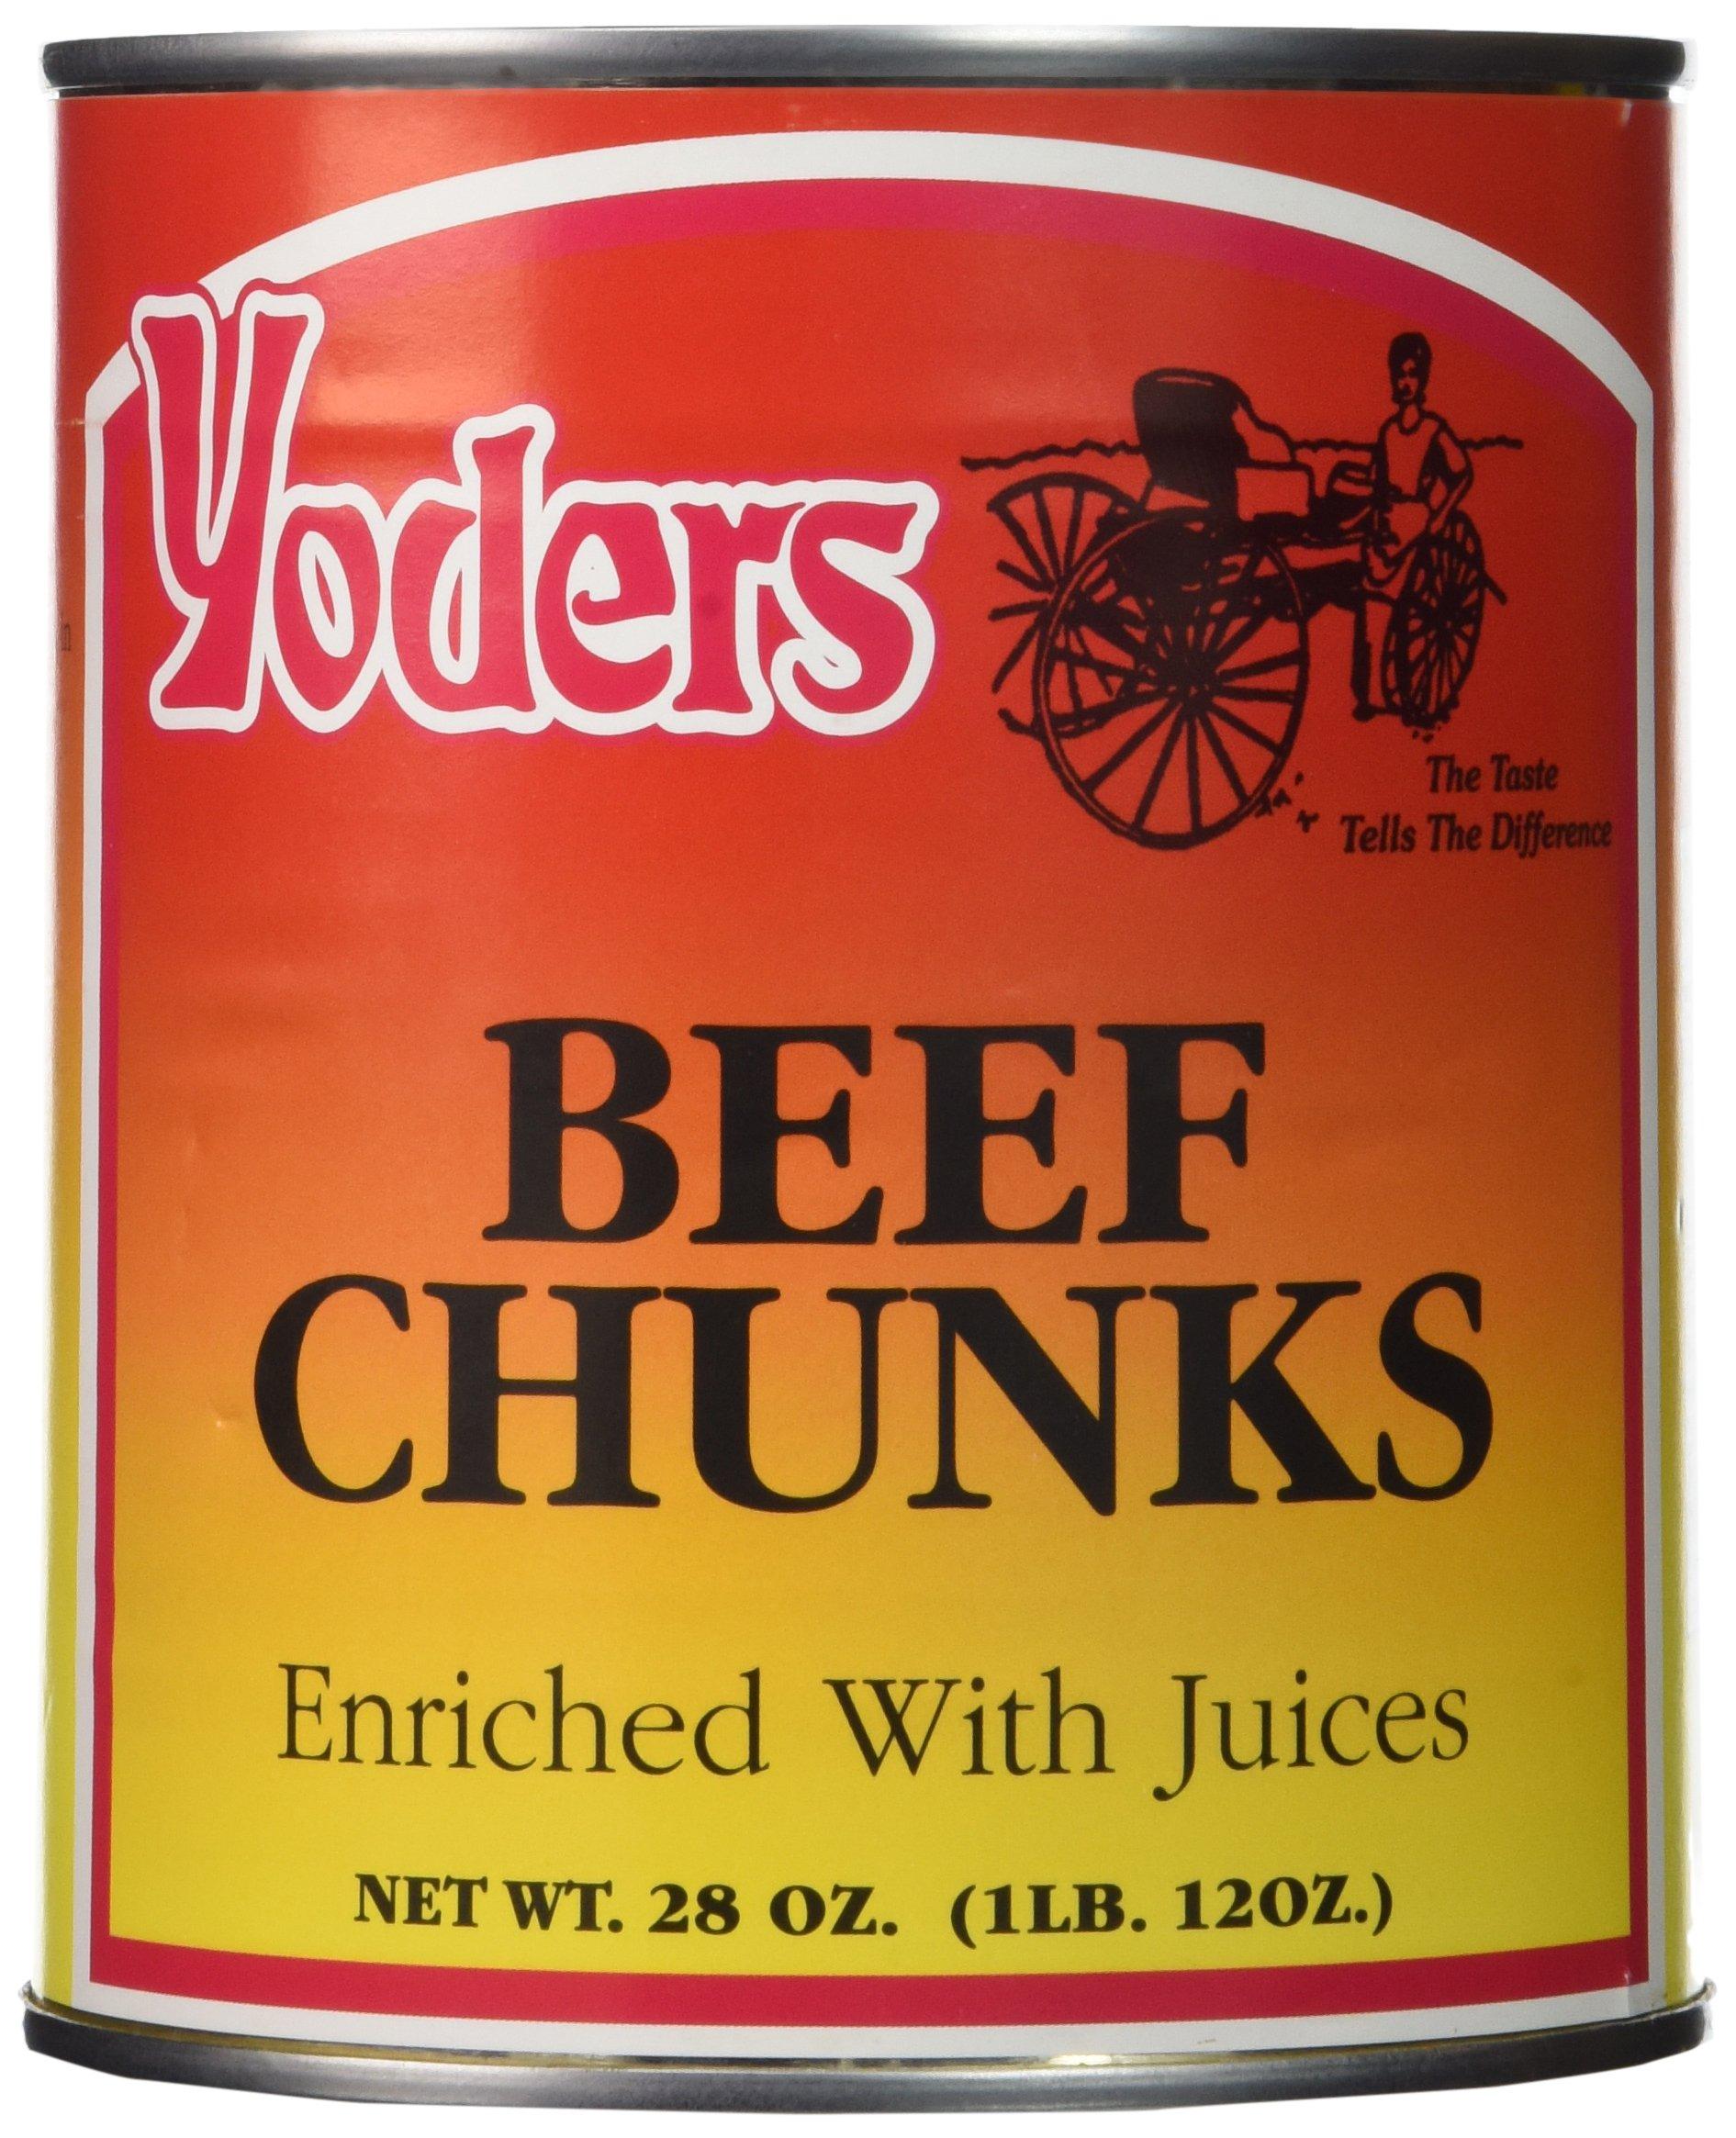 Yoder's Canned Premium Boneless Beef Chunks, 28 Oz(1 lb.12 Oz,1 can)